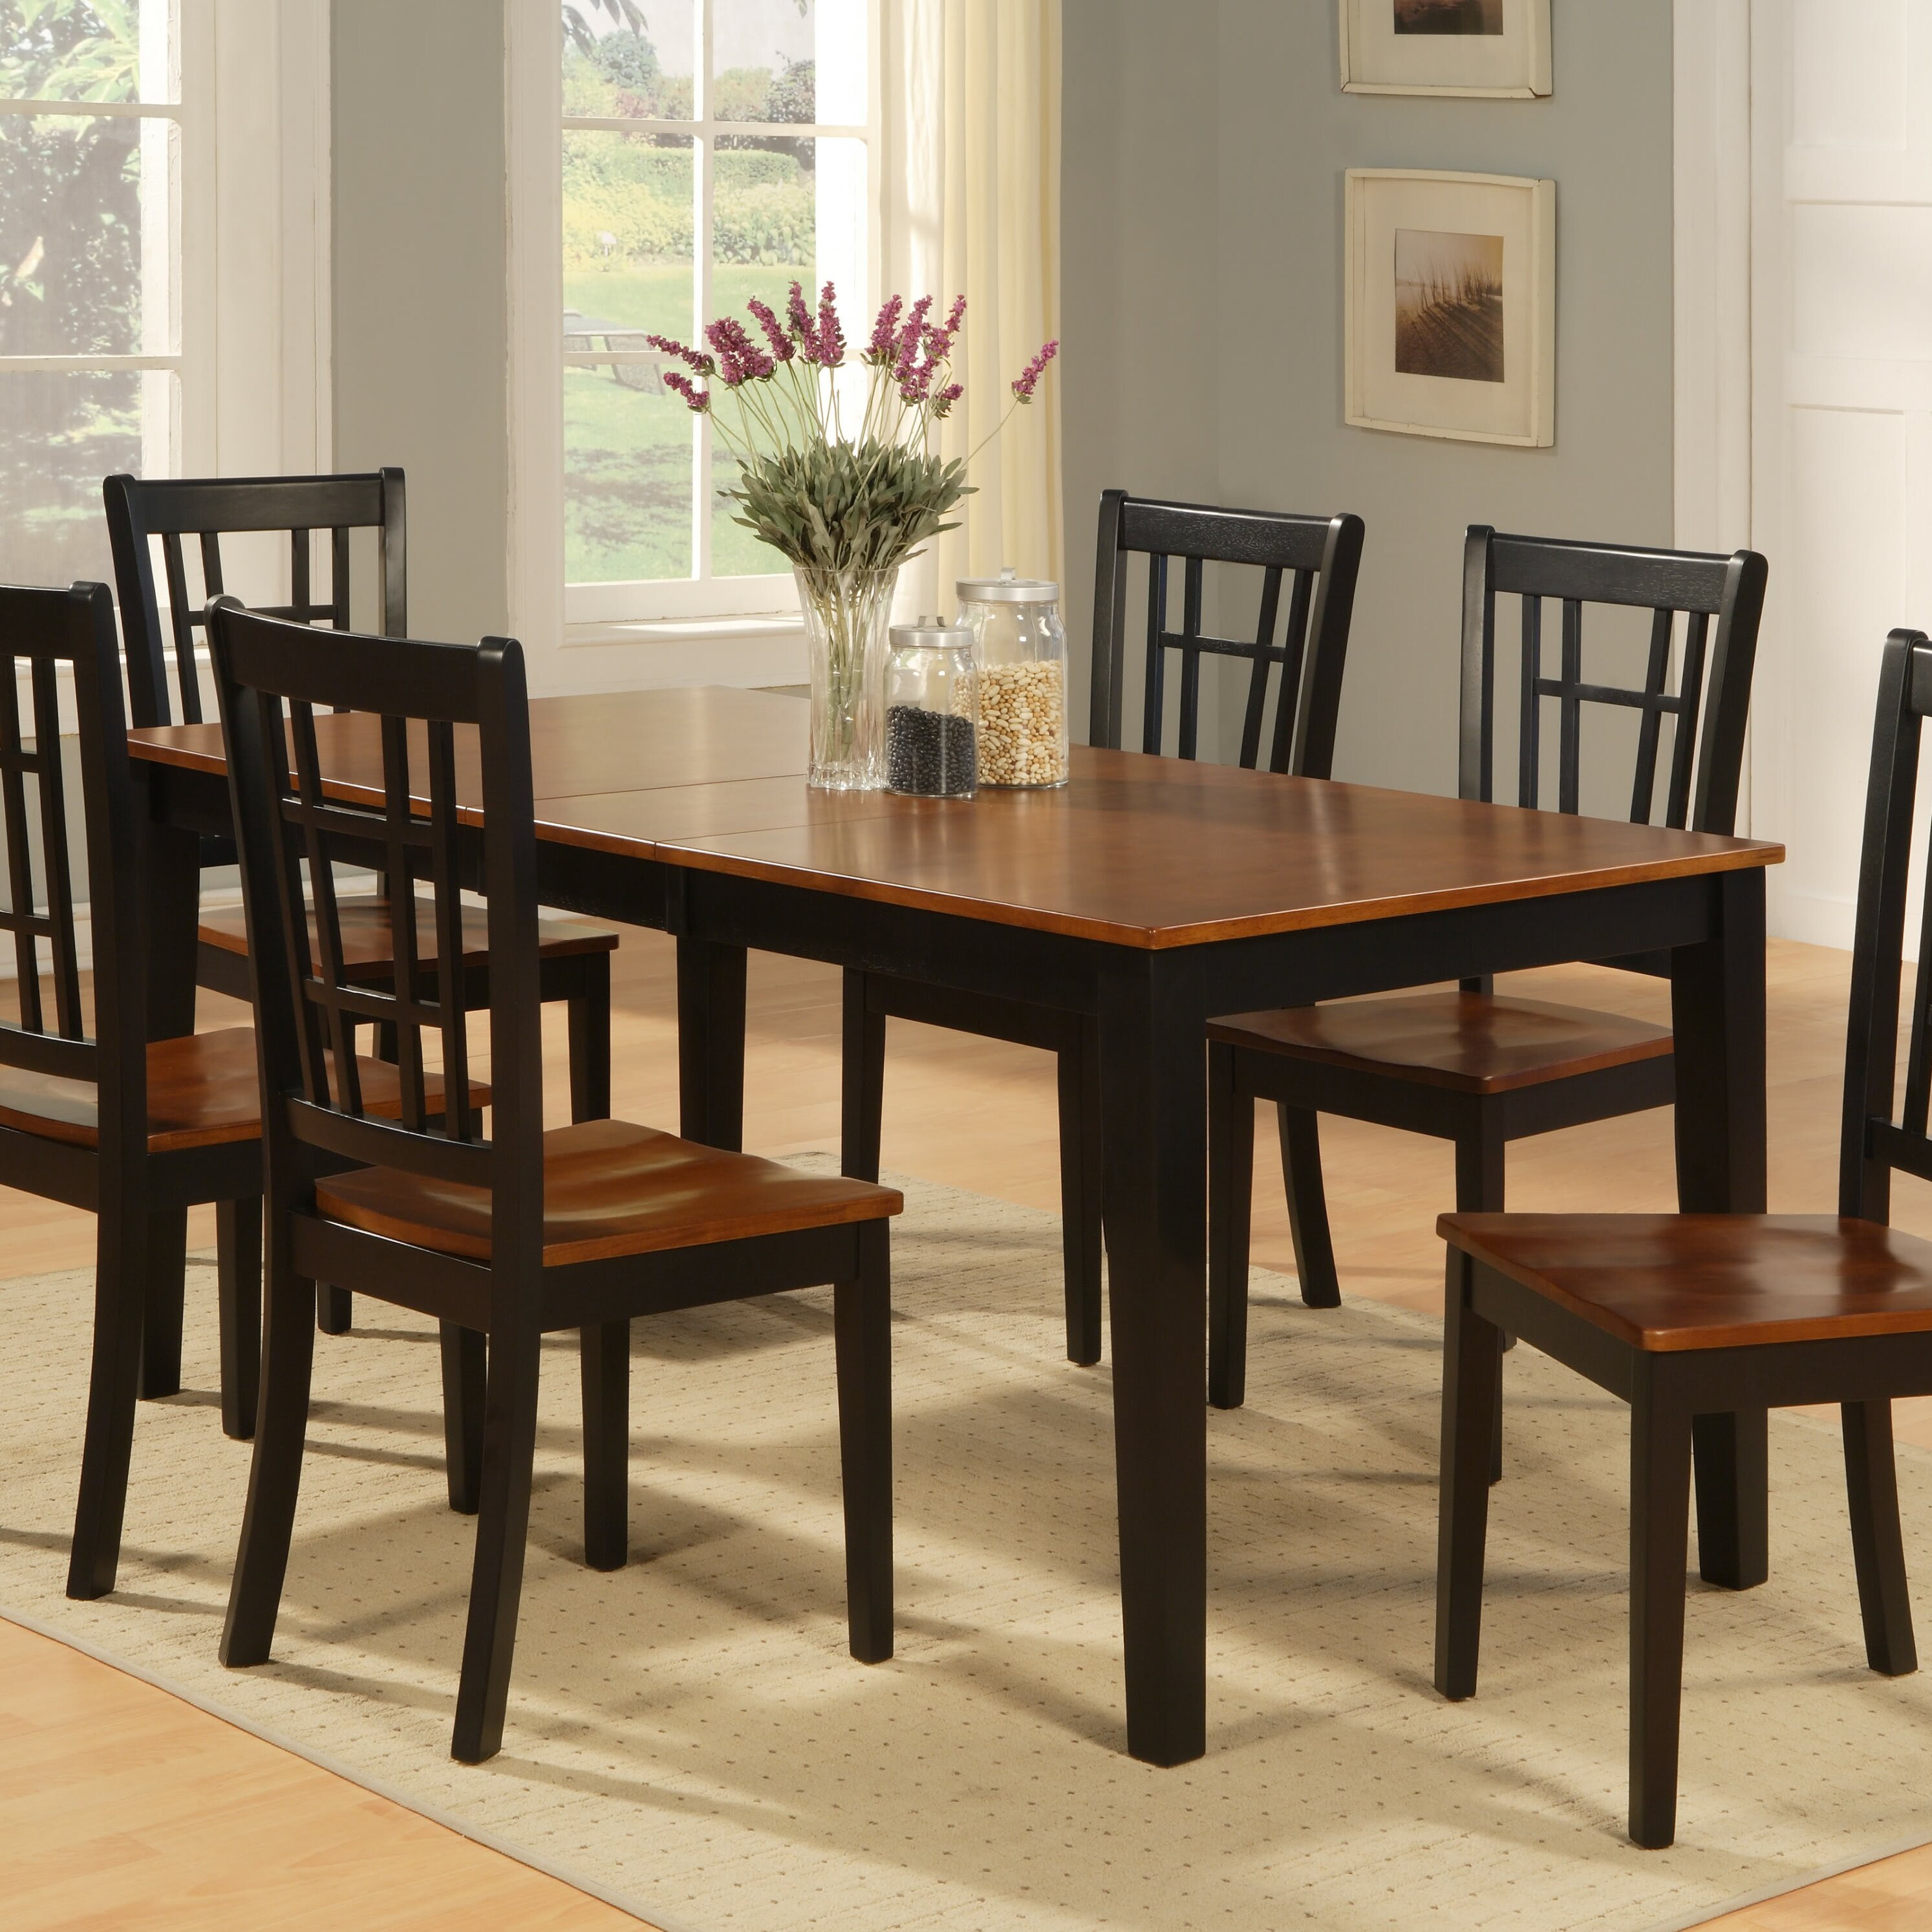 Wayfair Table: East West Nicoli Dining Table & Reviews